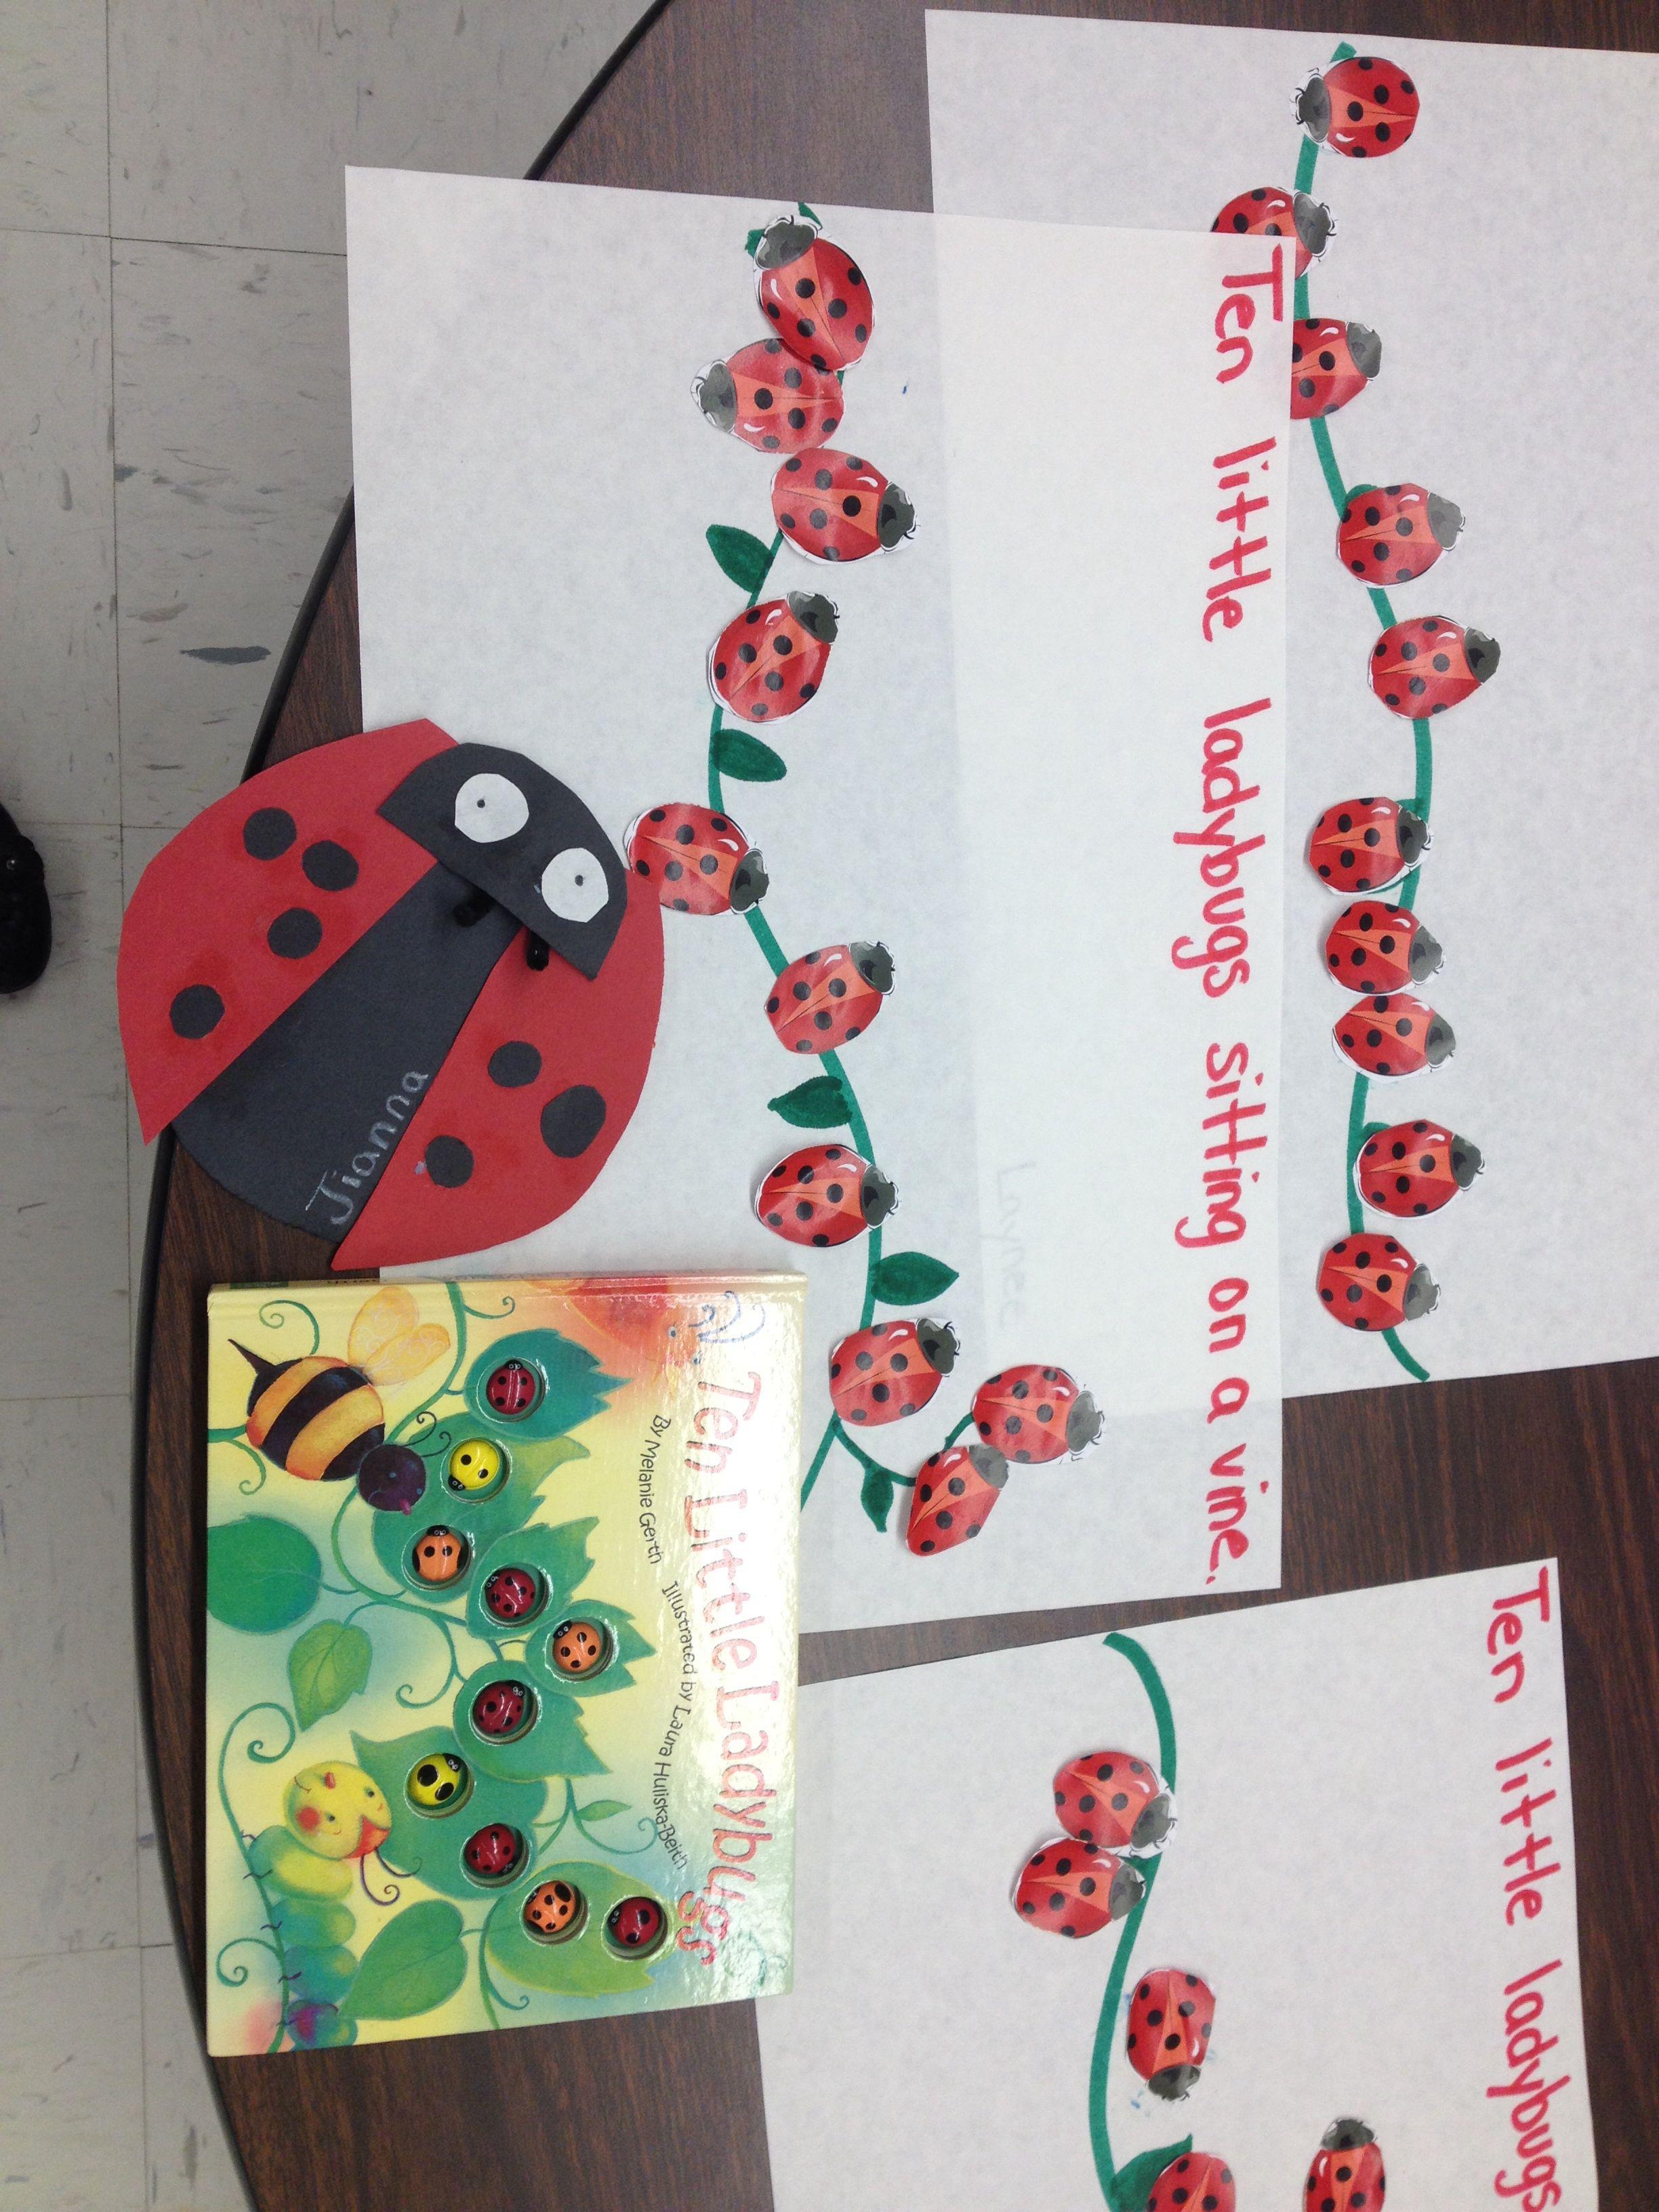 10 little ladybugs activities